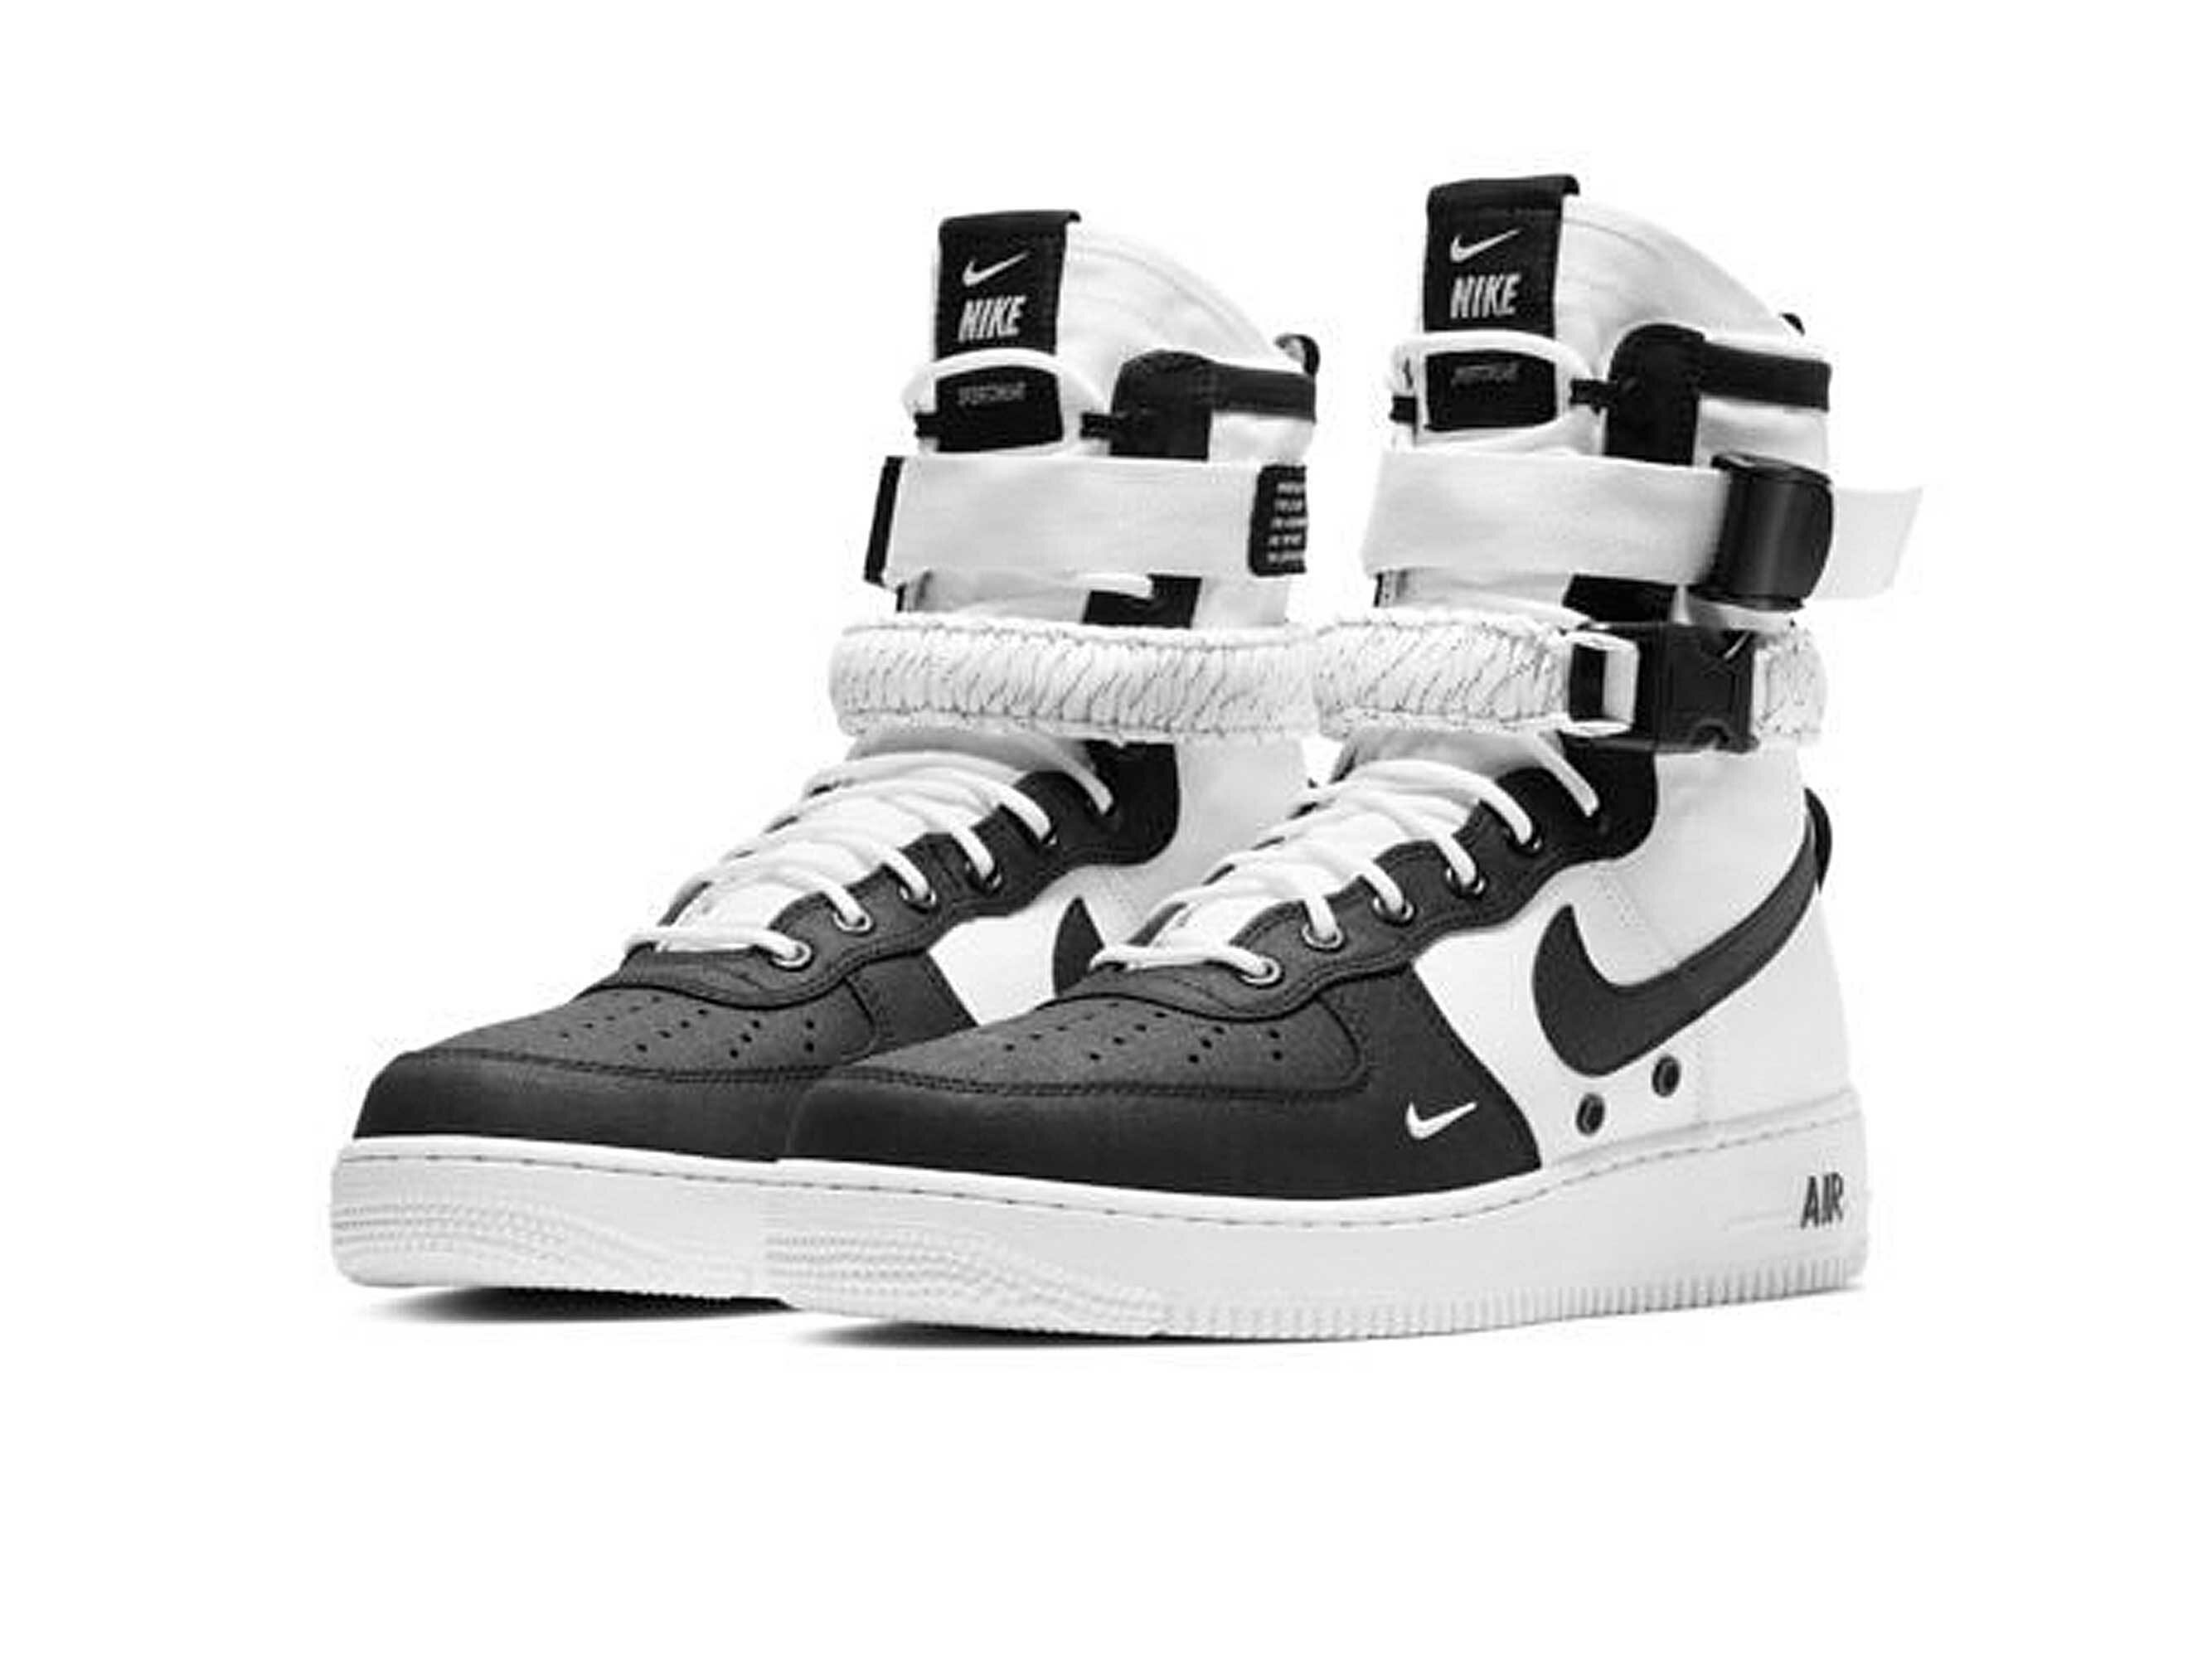 nike sf air force 1 black white купить